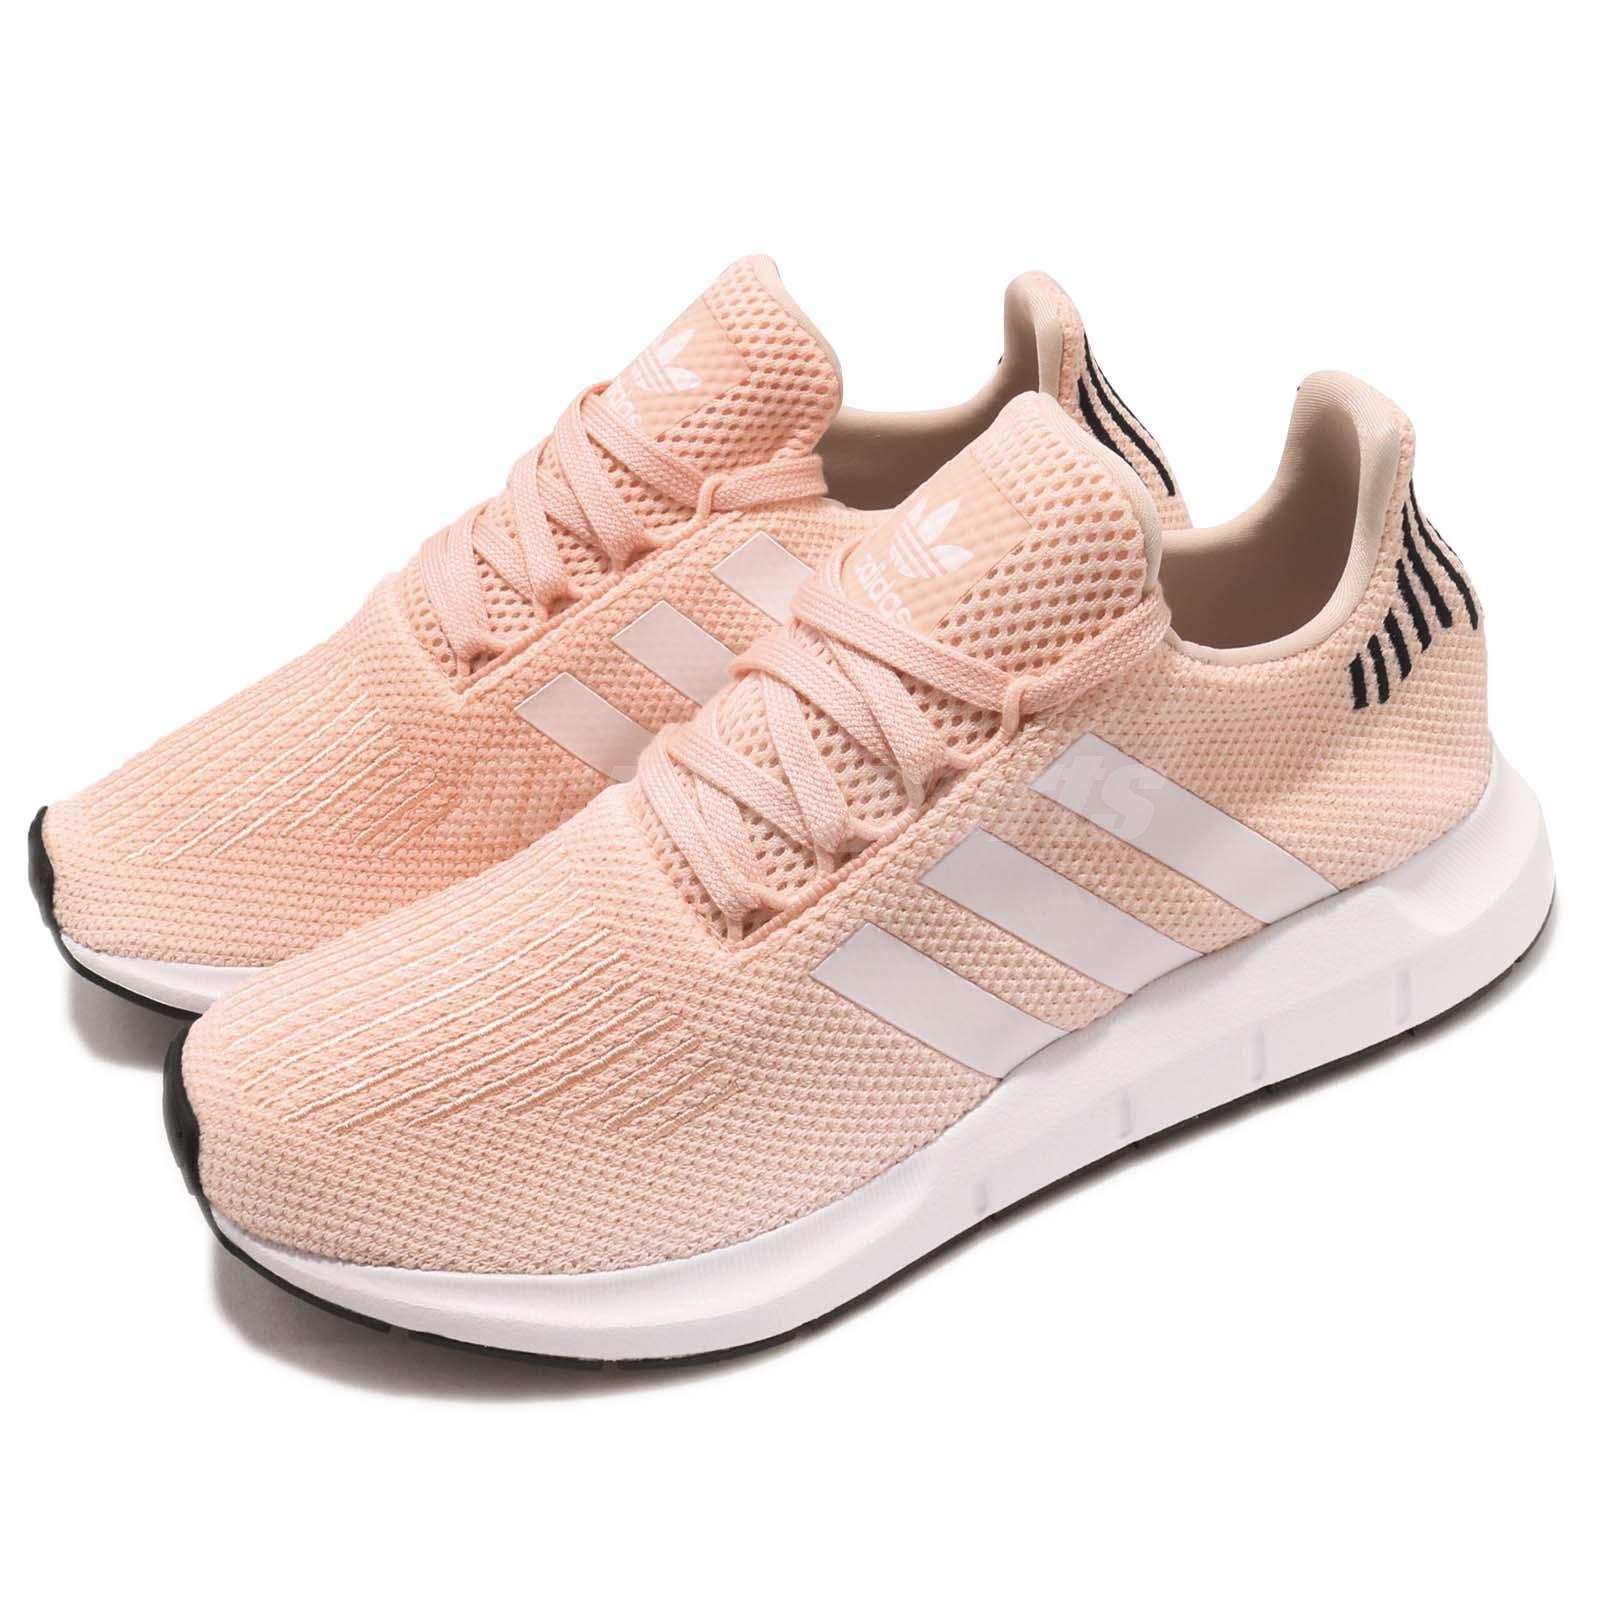 Details about adidas Originals Swift Run W Pink Black White Women Running Shoes Sneaker B37681